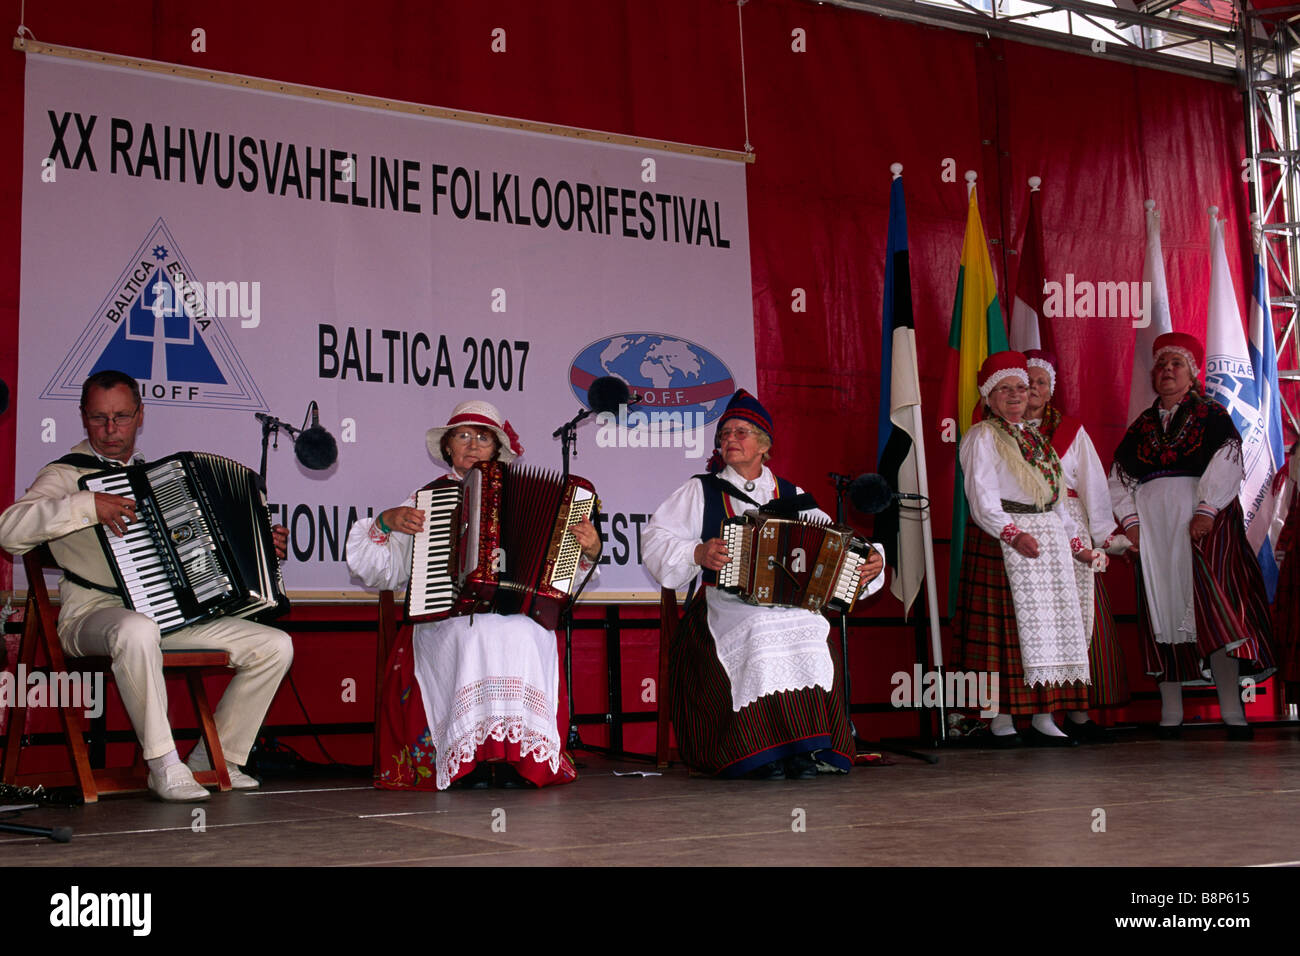 estonia, tallinn, raekoja plats, women wearing traditional clothes, baltica 2007 folklore festival - Stock Image